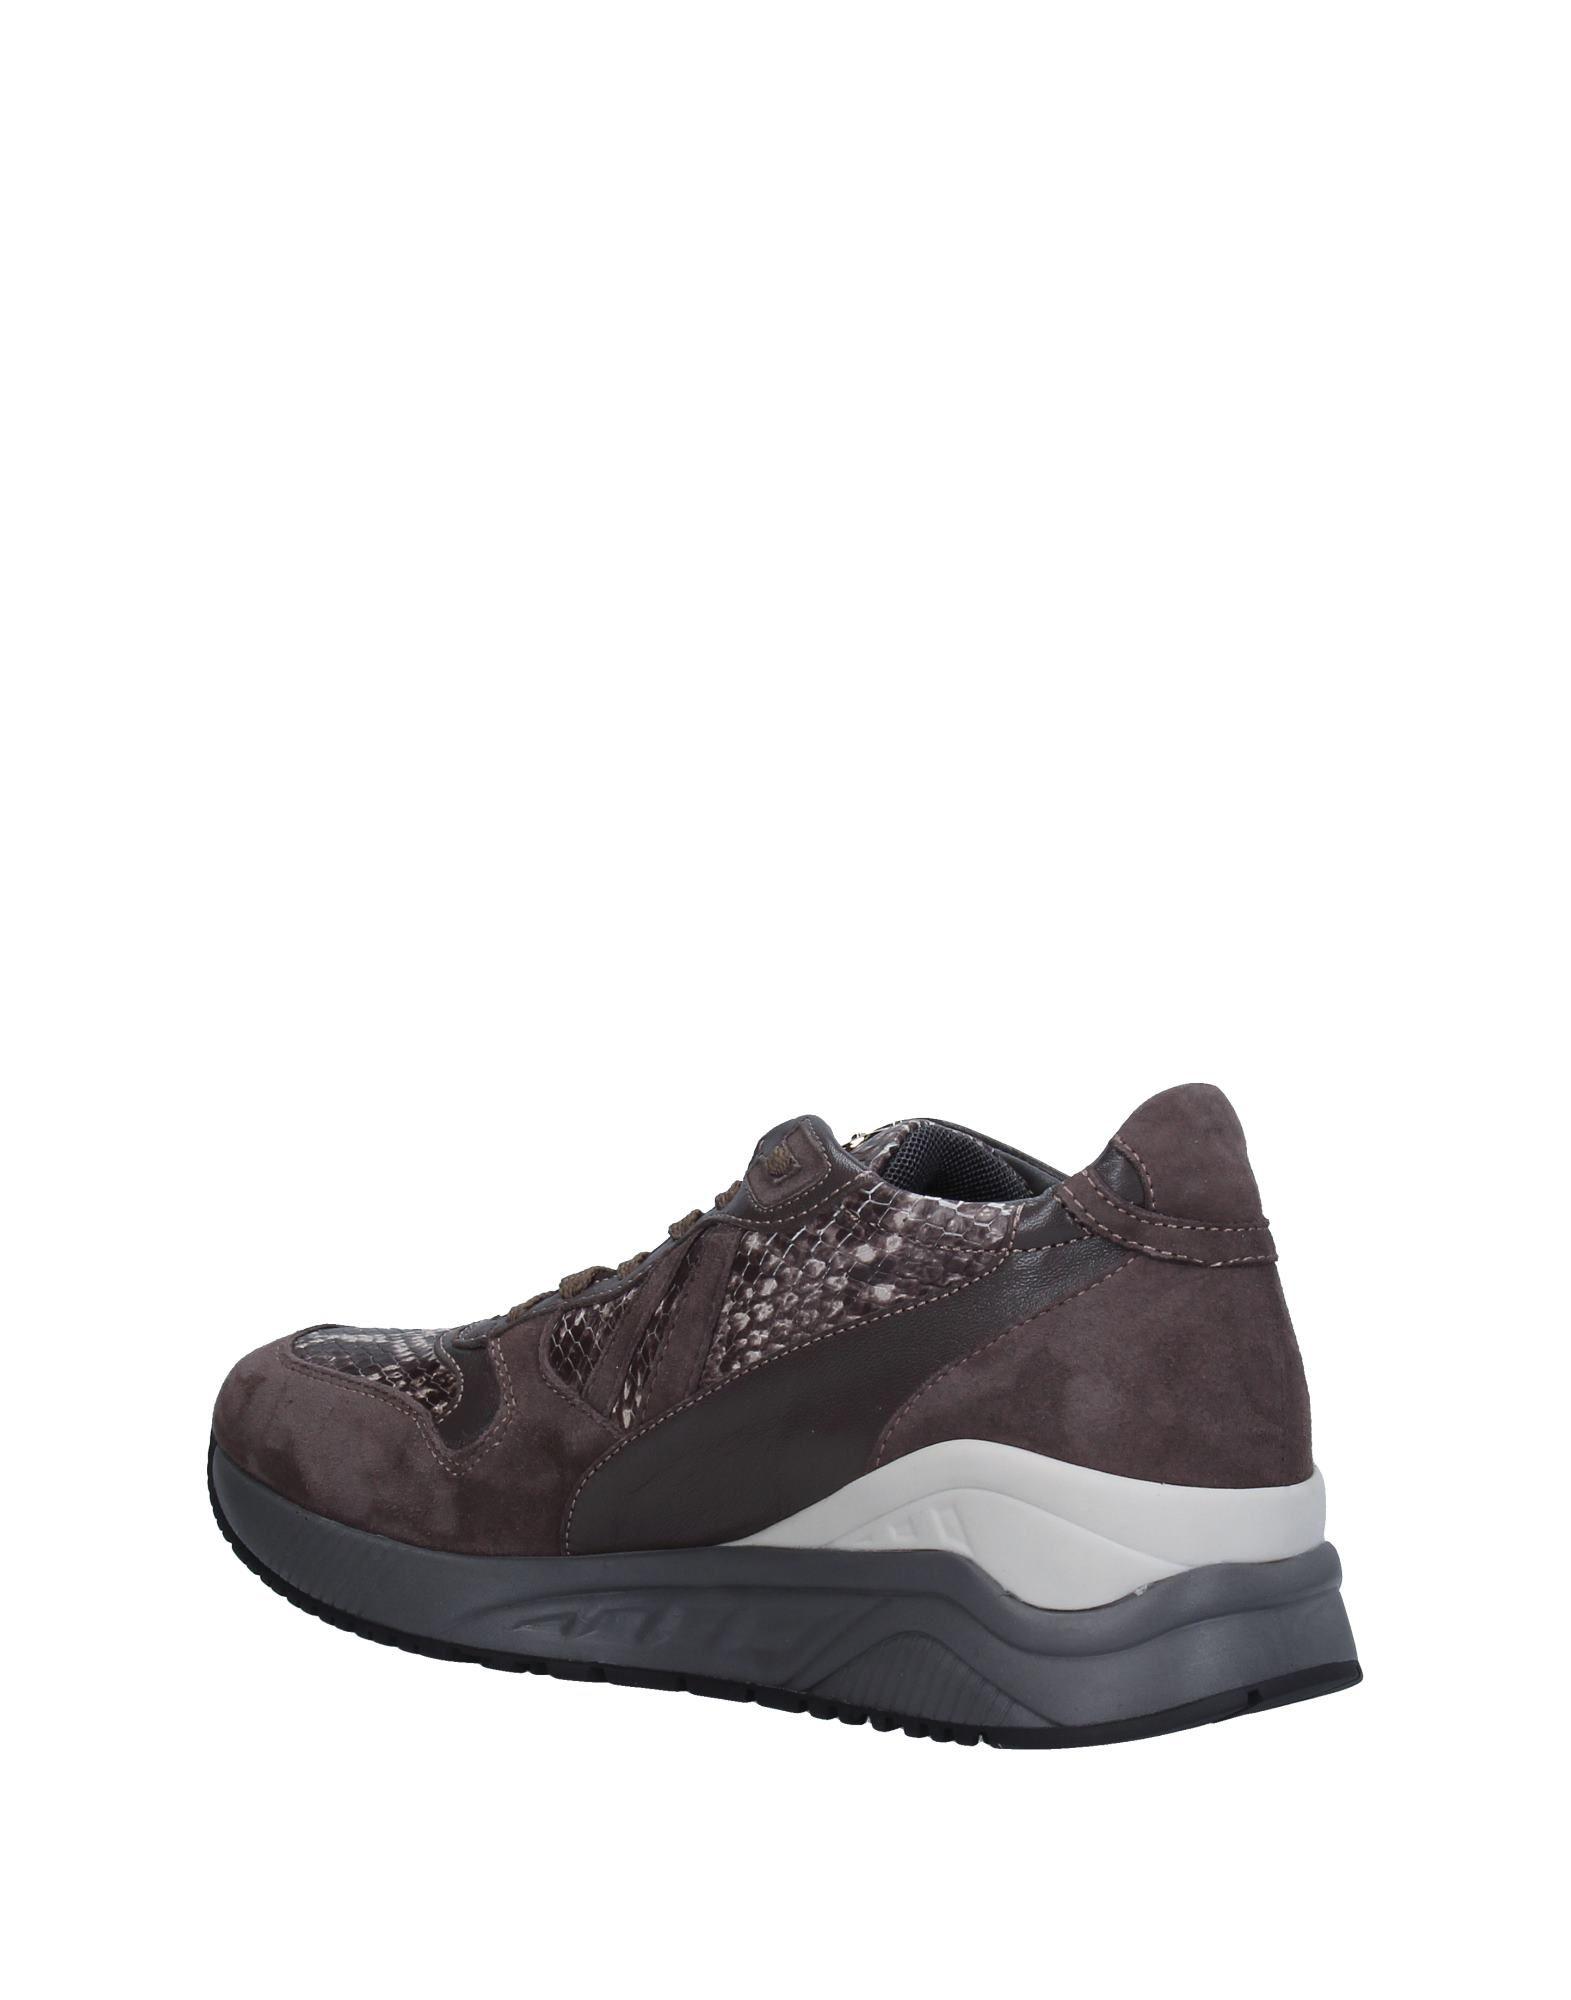 Cesare Paciotti 4Us Sneakers Damen  11274386HTGut aussehende strapazierfähige Schuhe